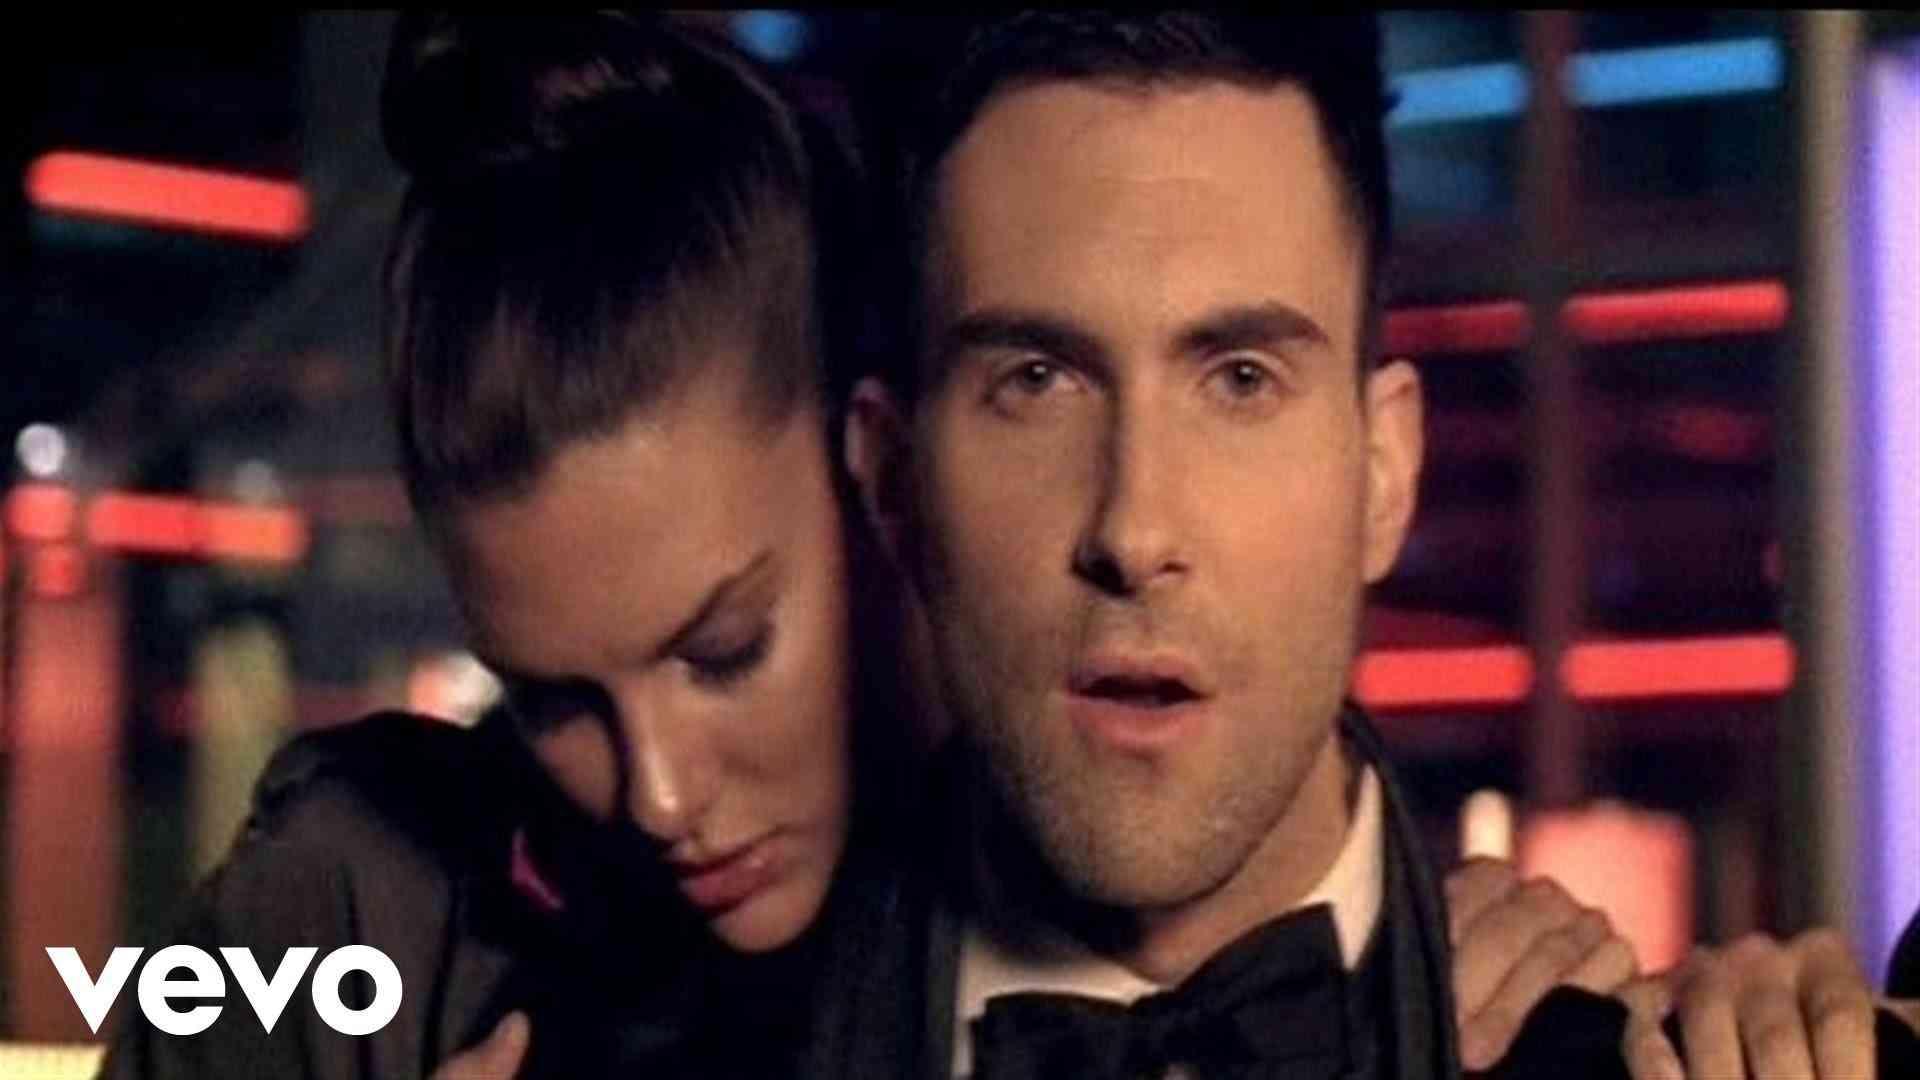 Maroon 5 - Makes Me Wonder - YouTube